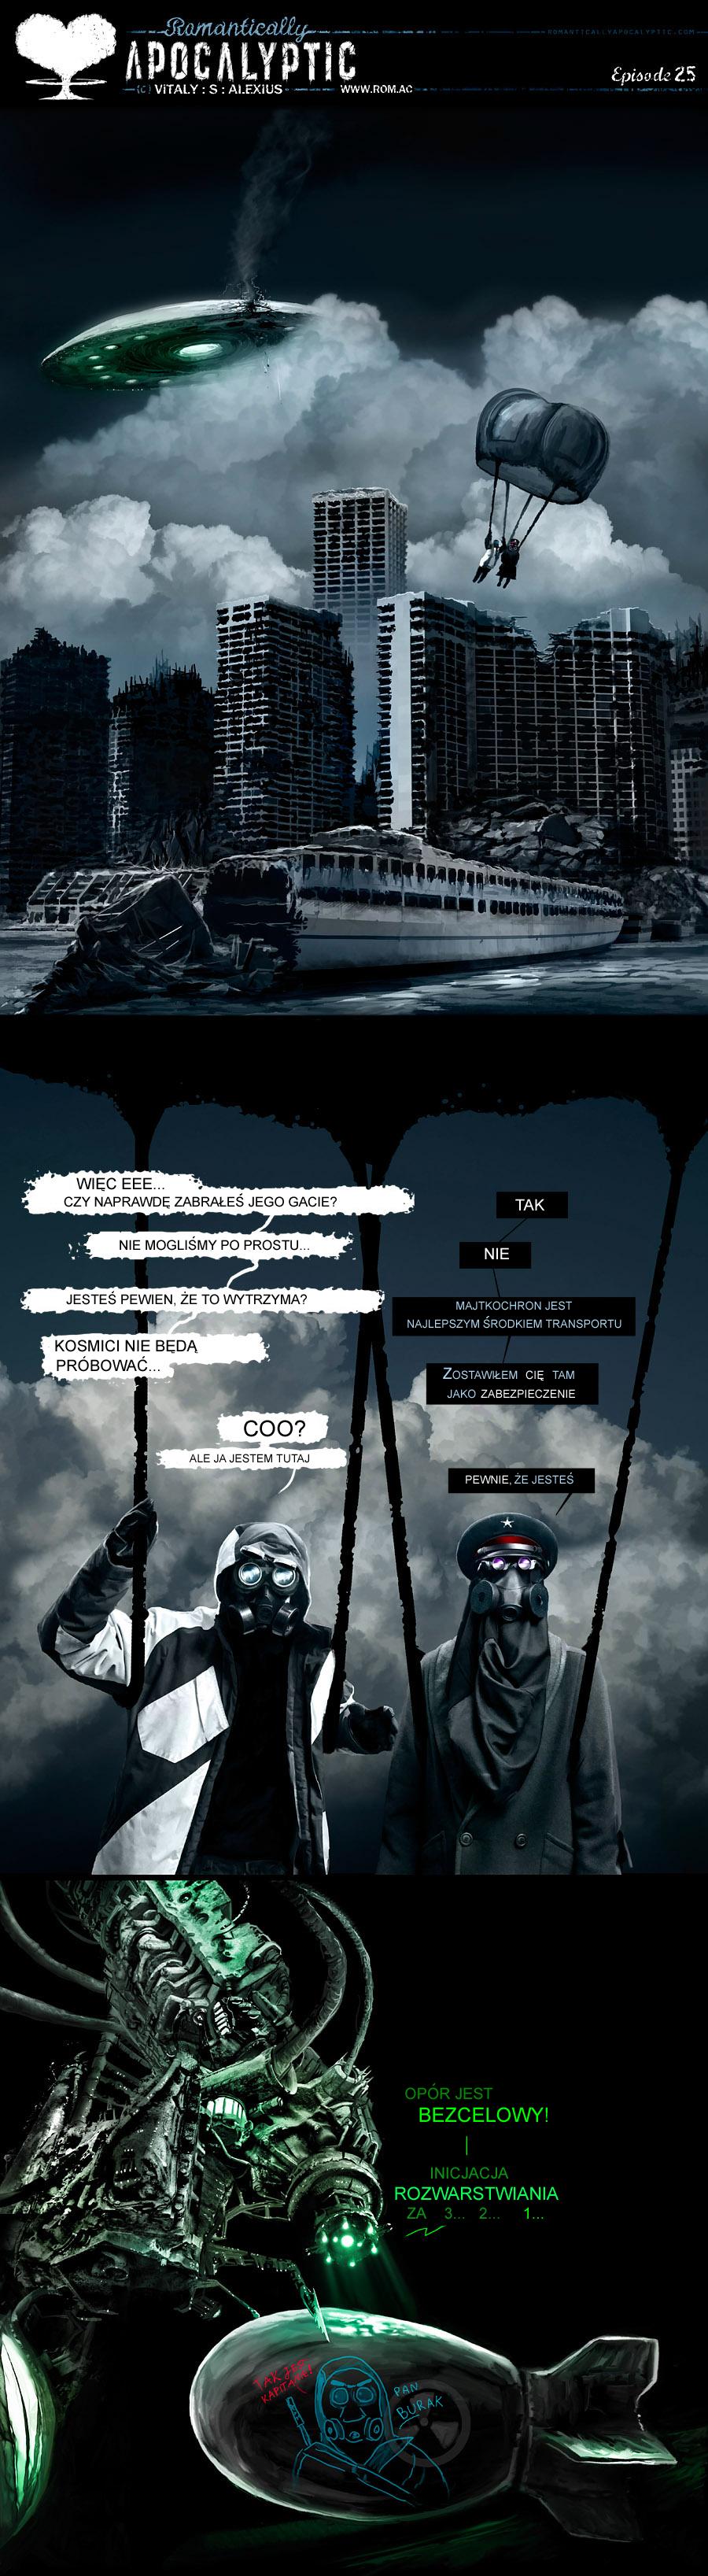 Romantically Apocalyptic 25 PL by Shyga